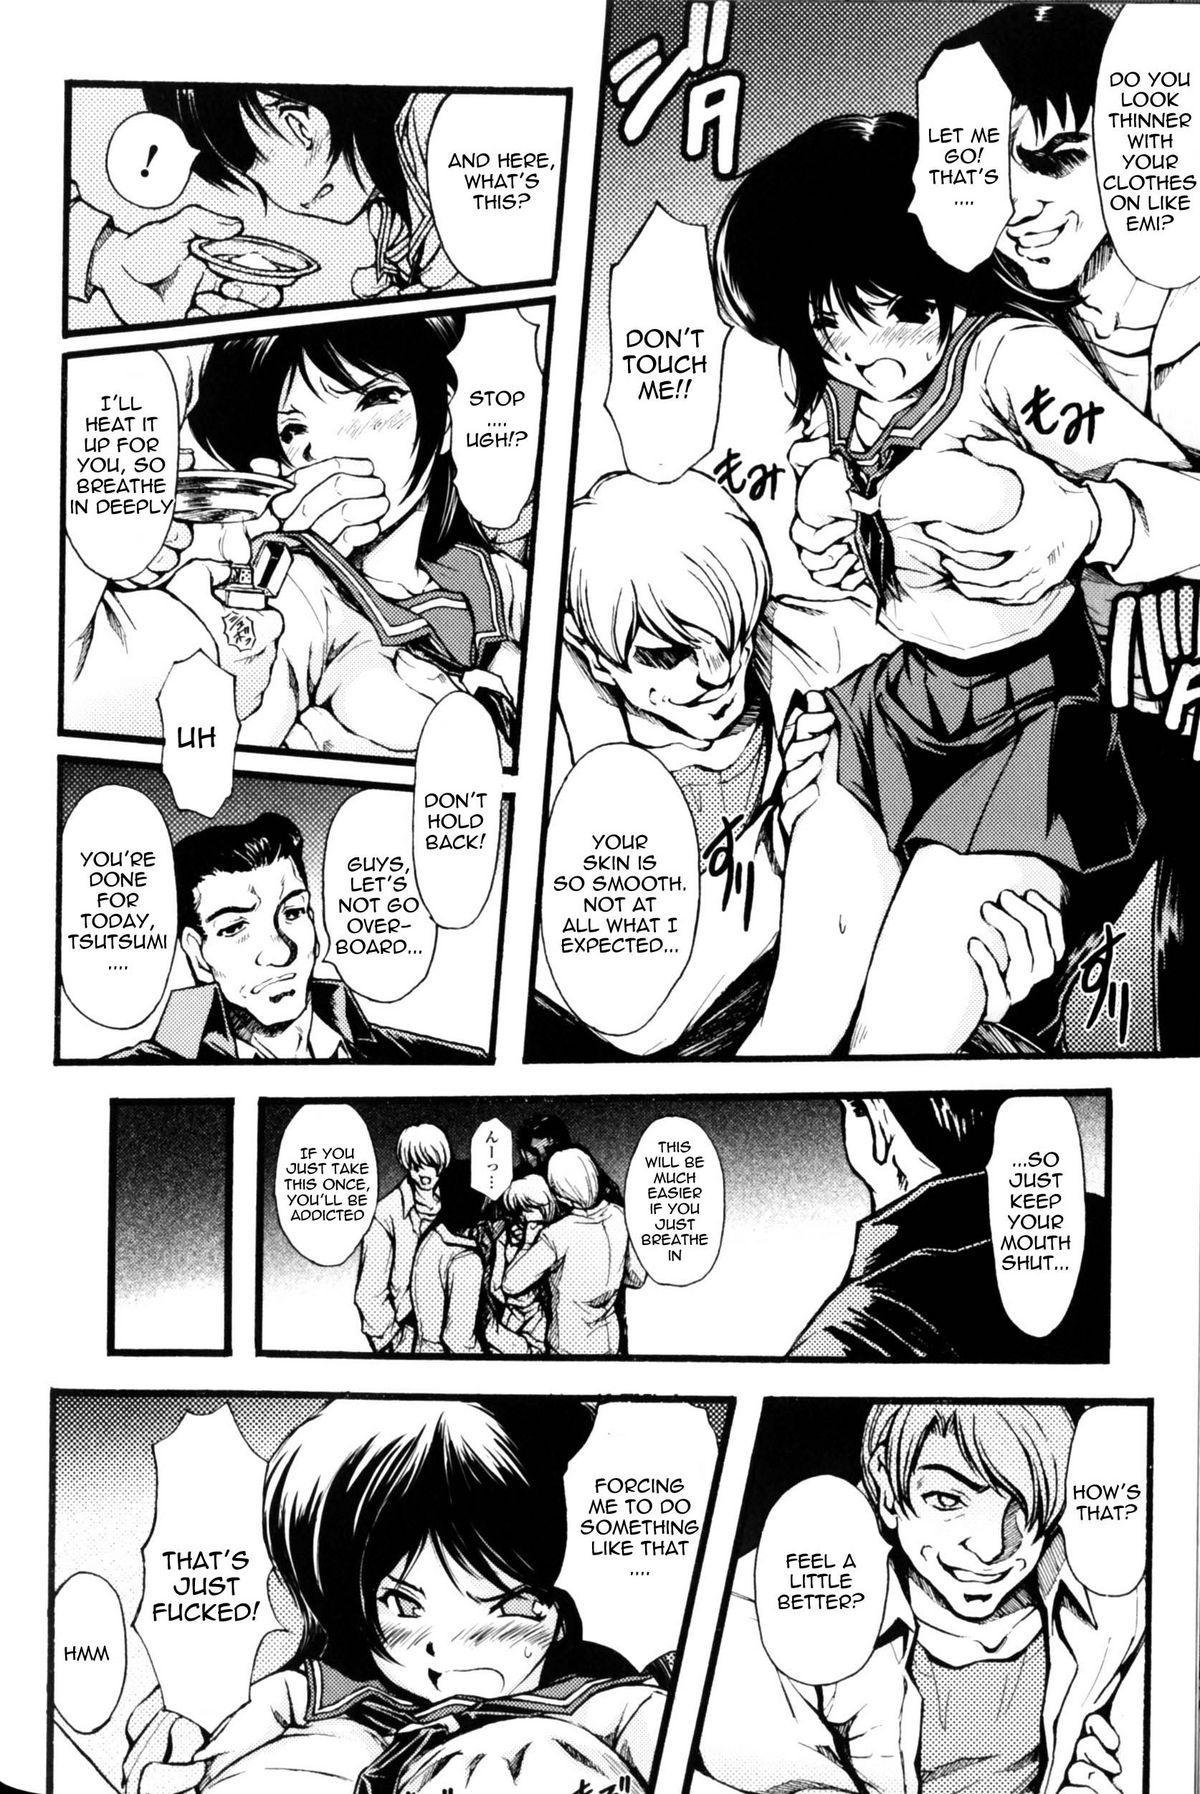 Itzuka-san's Case File 7